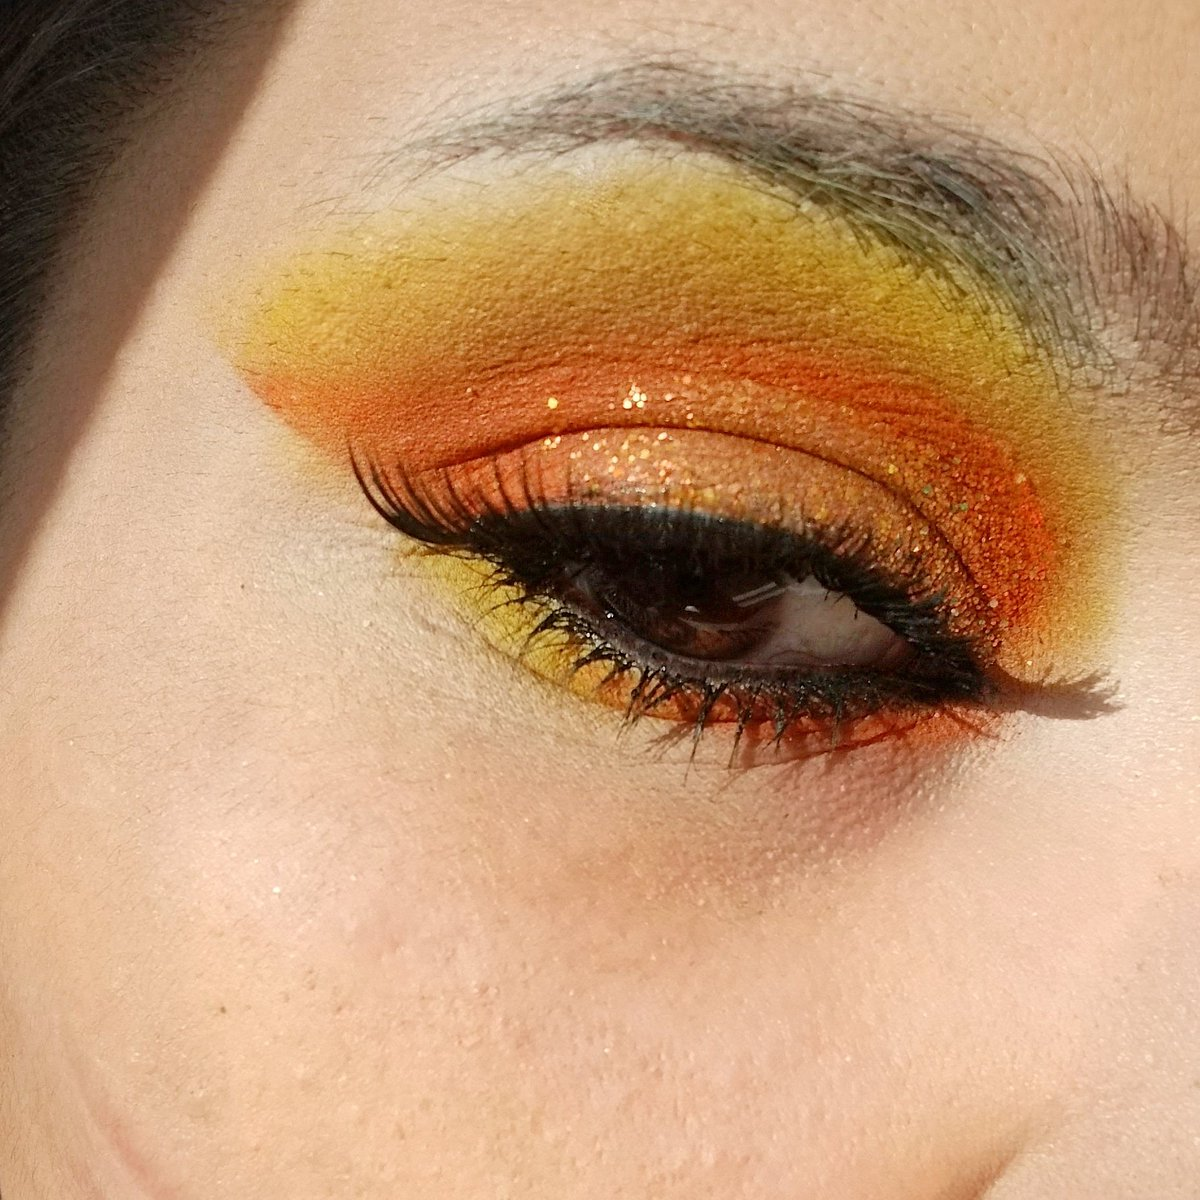 Im sorry I didnt have Time to do my Eyebrow so Please Ignore That!✅✅😋 Used the @Glamlite Paint Pallet and @ColourPopCo Shes a Rainbow Pallet💖 #JeffreeStarCosmetics @JeffreeStar #jeffreestarprlist @Jaclynhill @MorpheBrushes @bhcosmetics @shopjKo @SeLfMaDeJMA @shopbellaandco